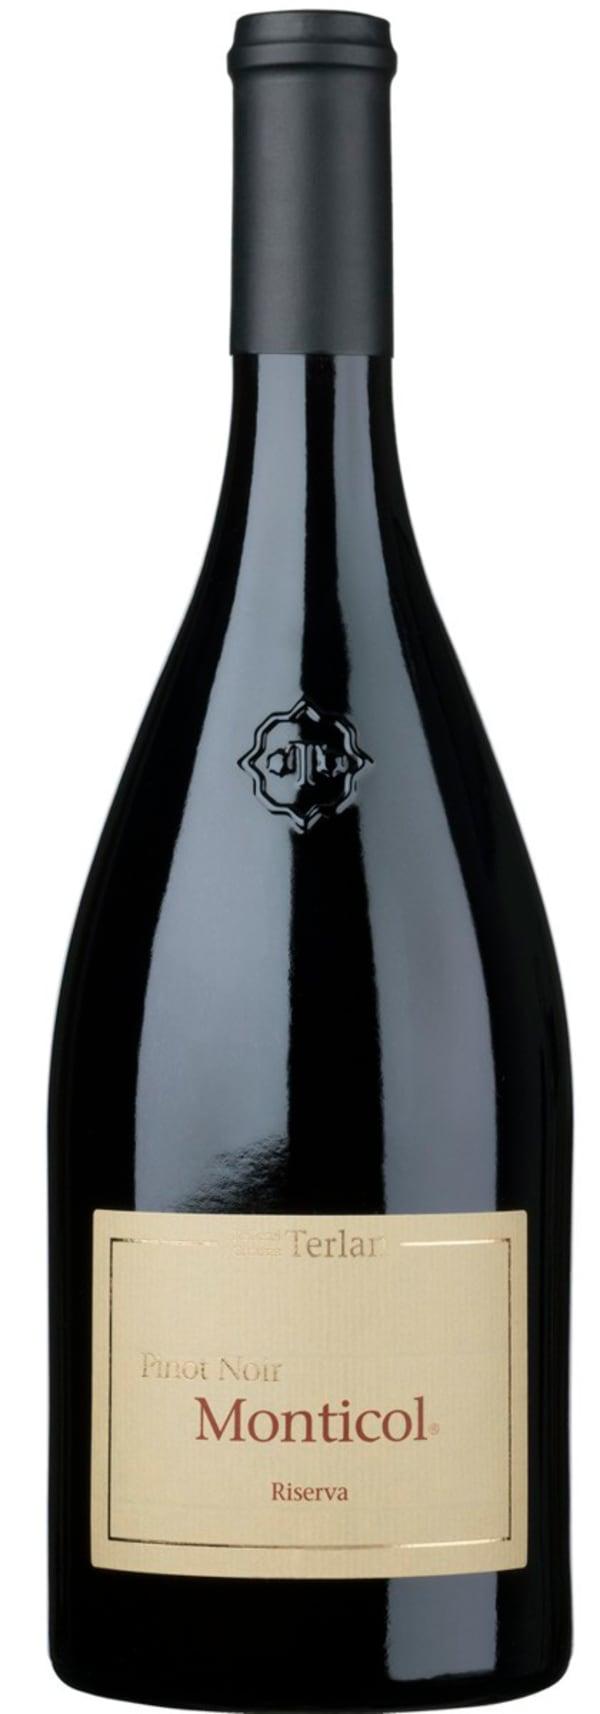 Cantina Terlan Monticol Riserva Pinot Noir 2015